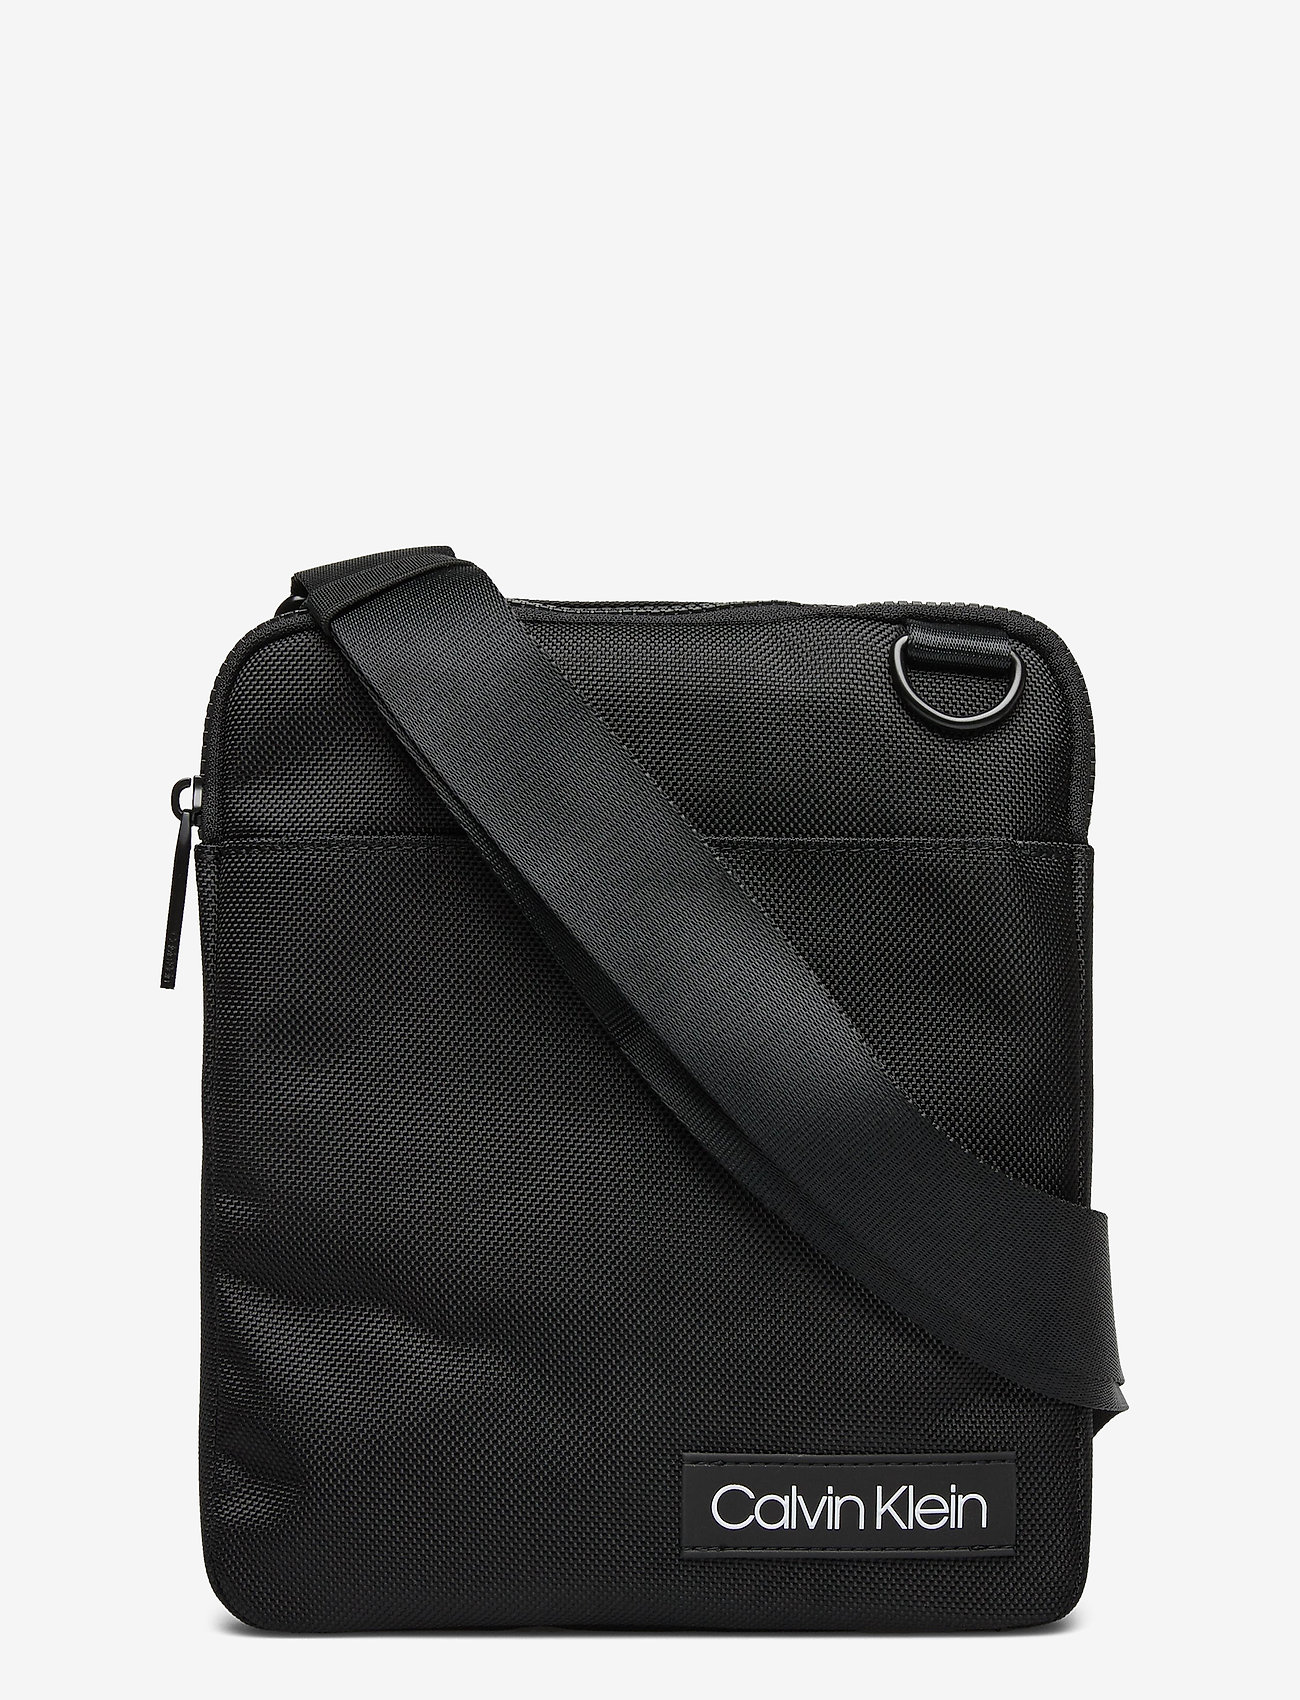 Calvin Klein - ULTIMATE NYLON FLAT - sacs à bandoulière - black - 0